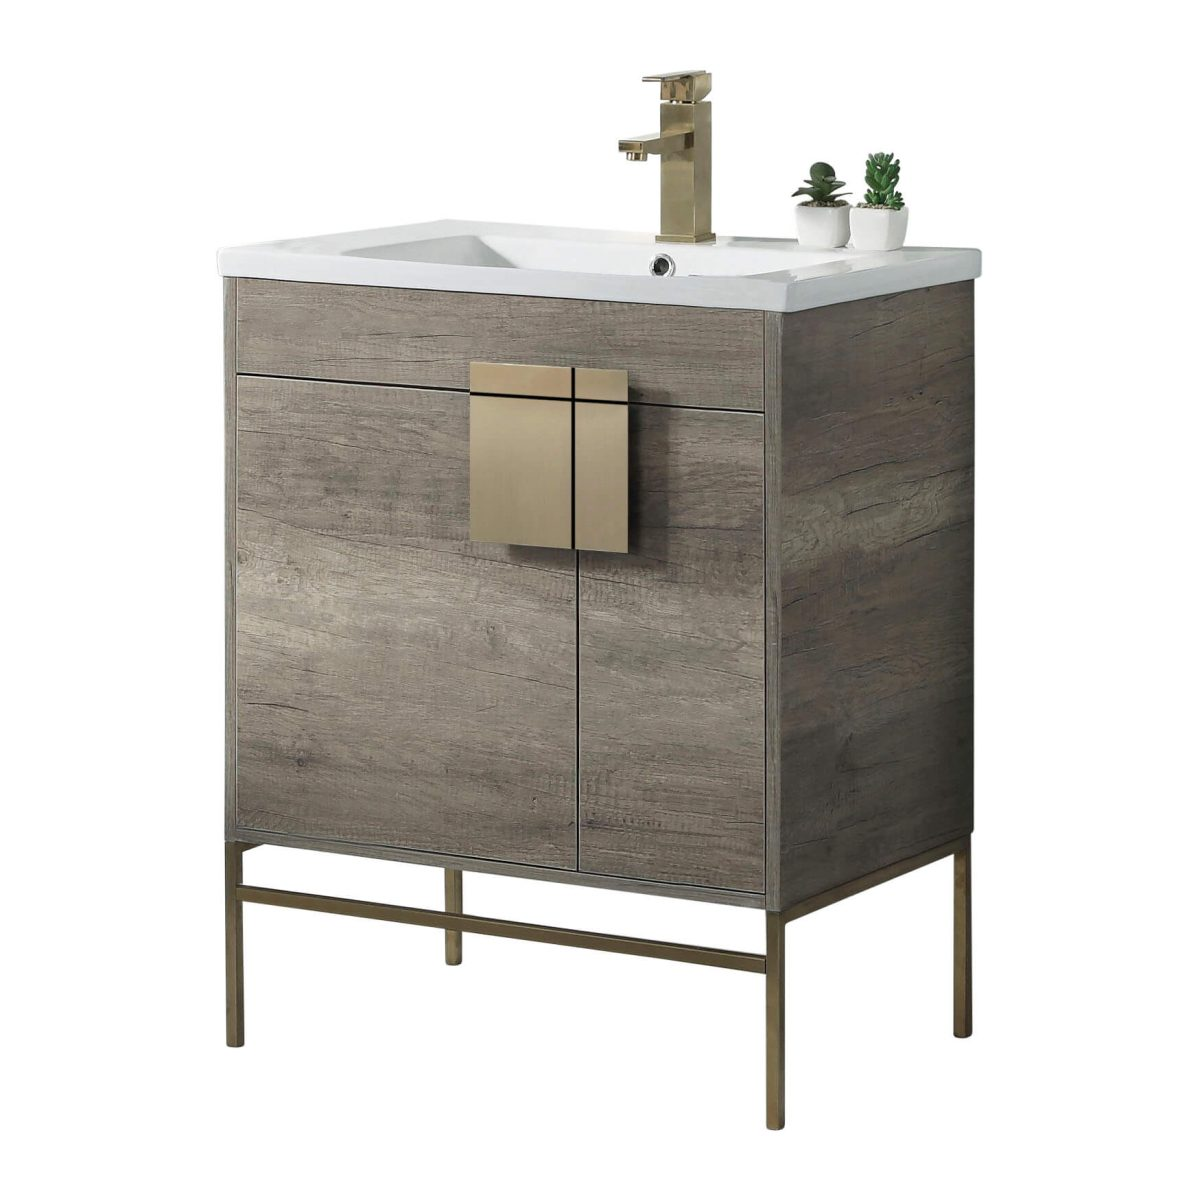 "Shawbridge 30"" Modern Bathroom Vanity  Shadow Gray with Satin Brass Hardware"